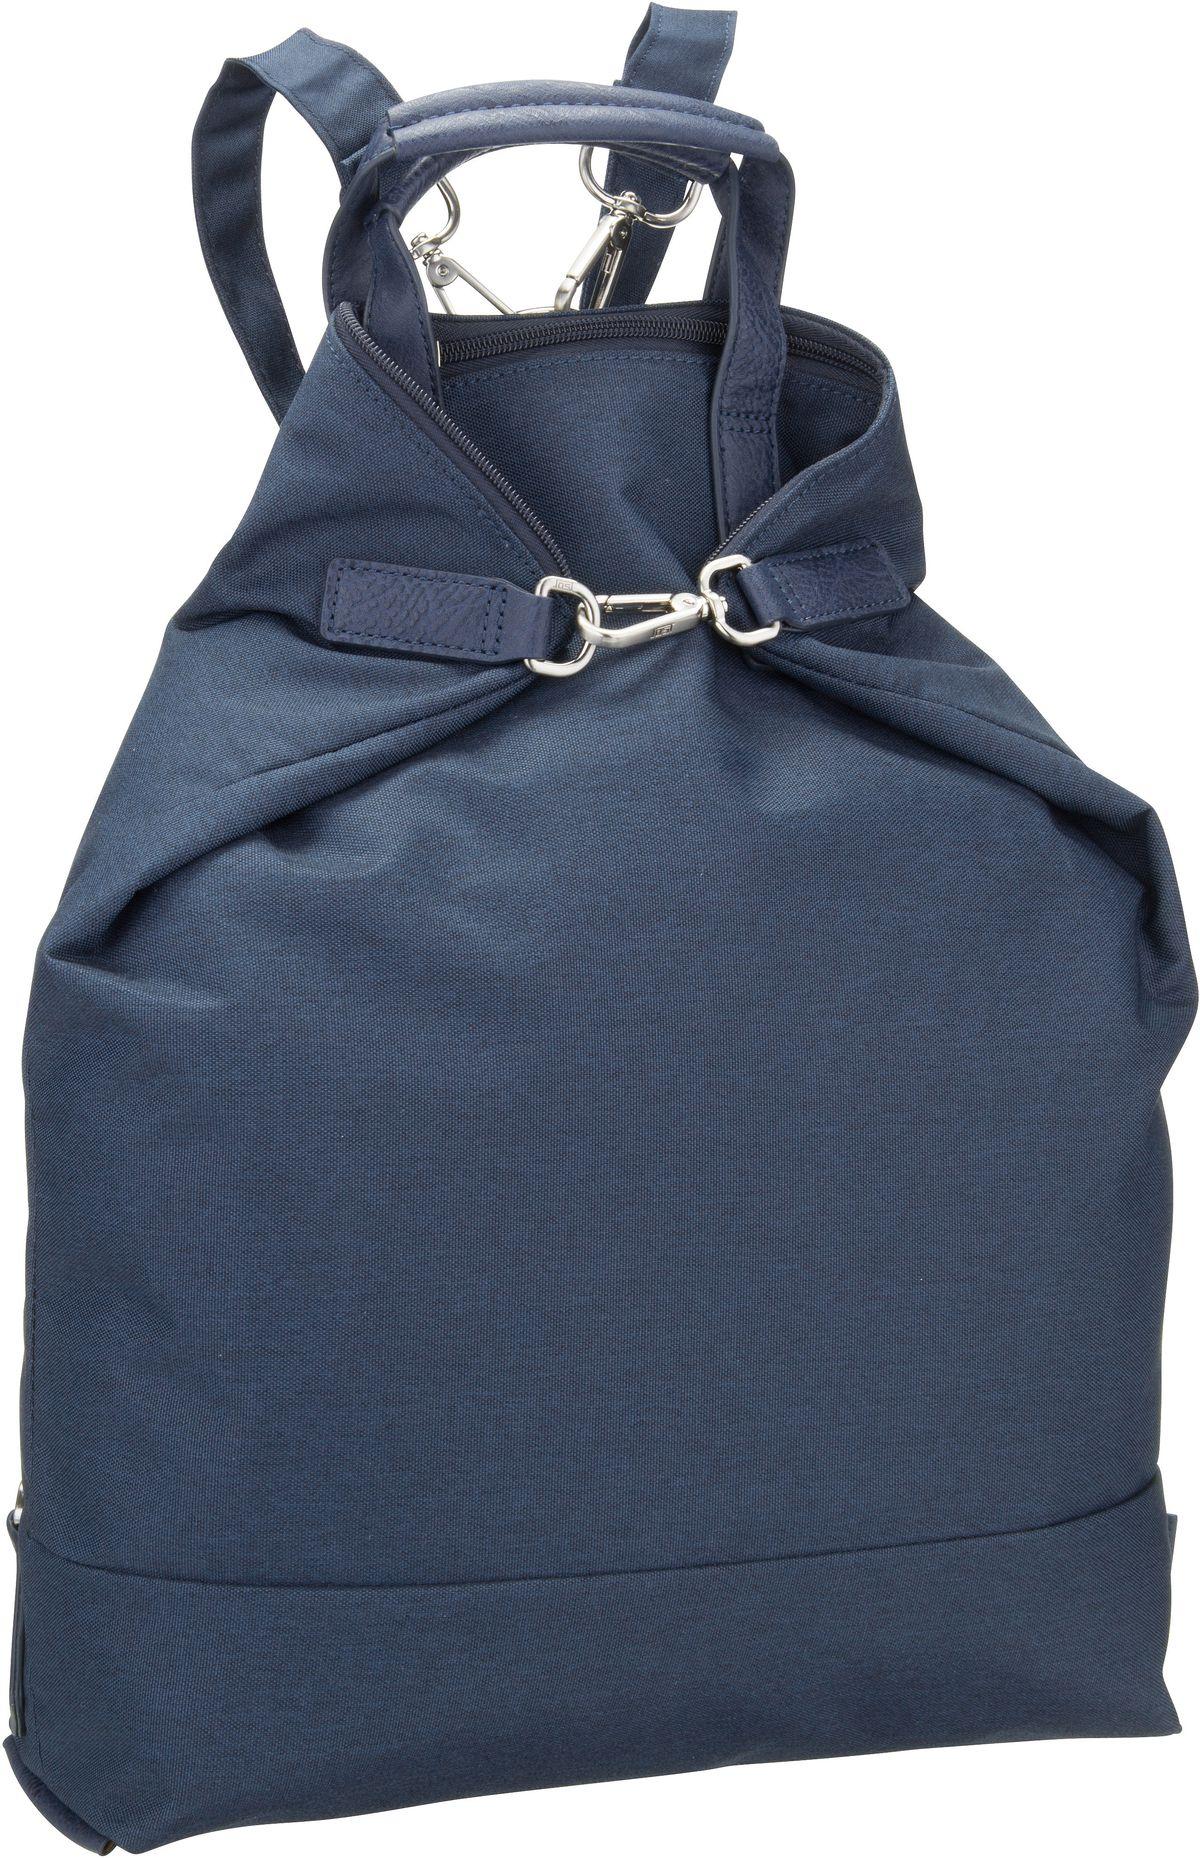 Jost Rucksack / Daypack 1105 X-Change Bag M Navy